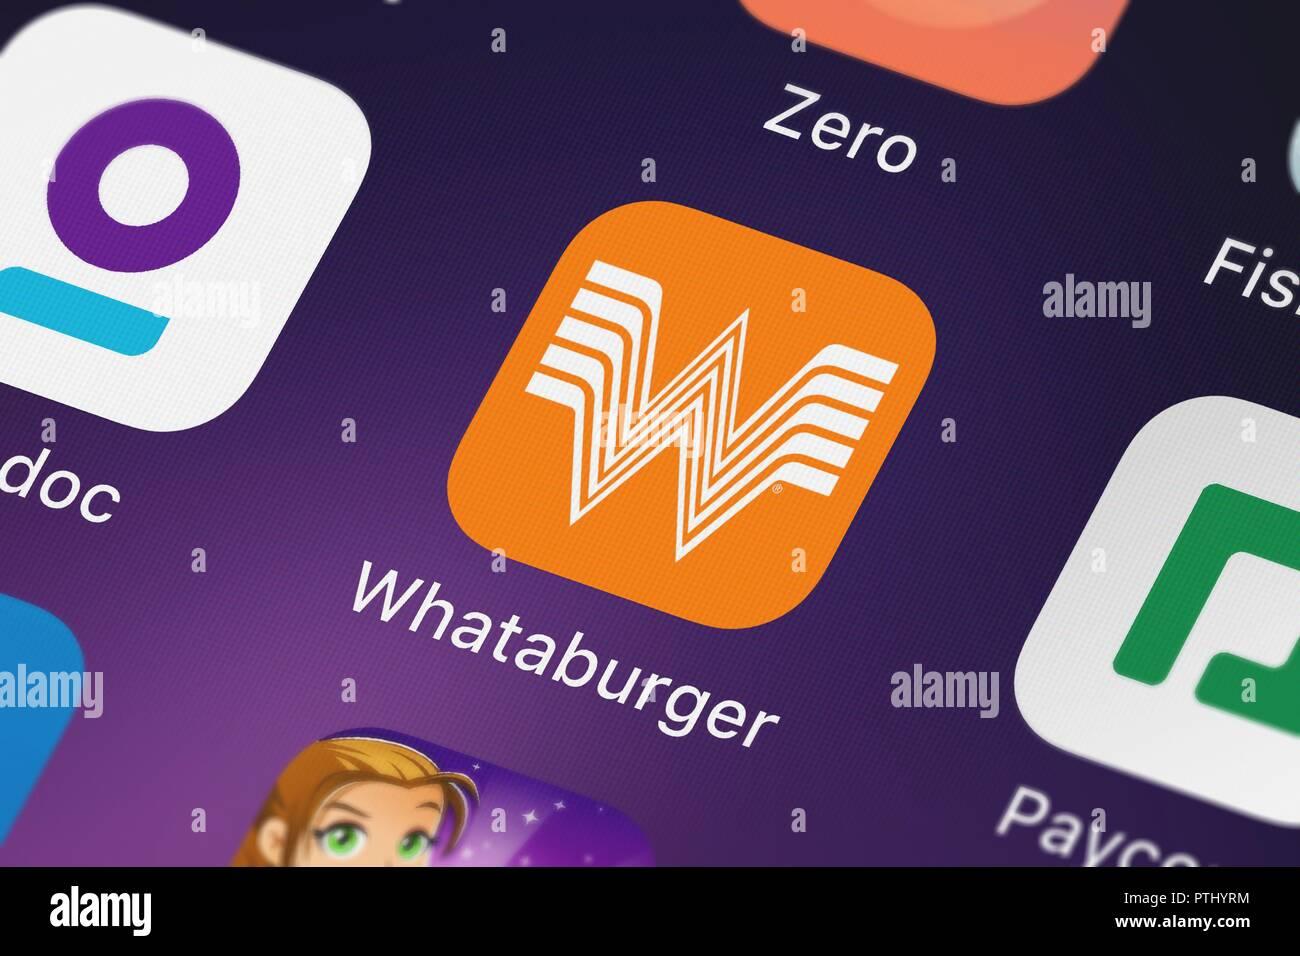 Whataburger Stock Photos & Whataburger Stock Images - Alamy